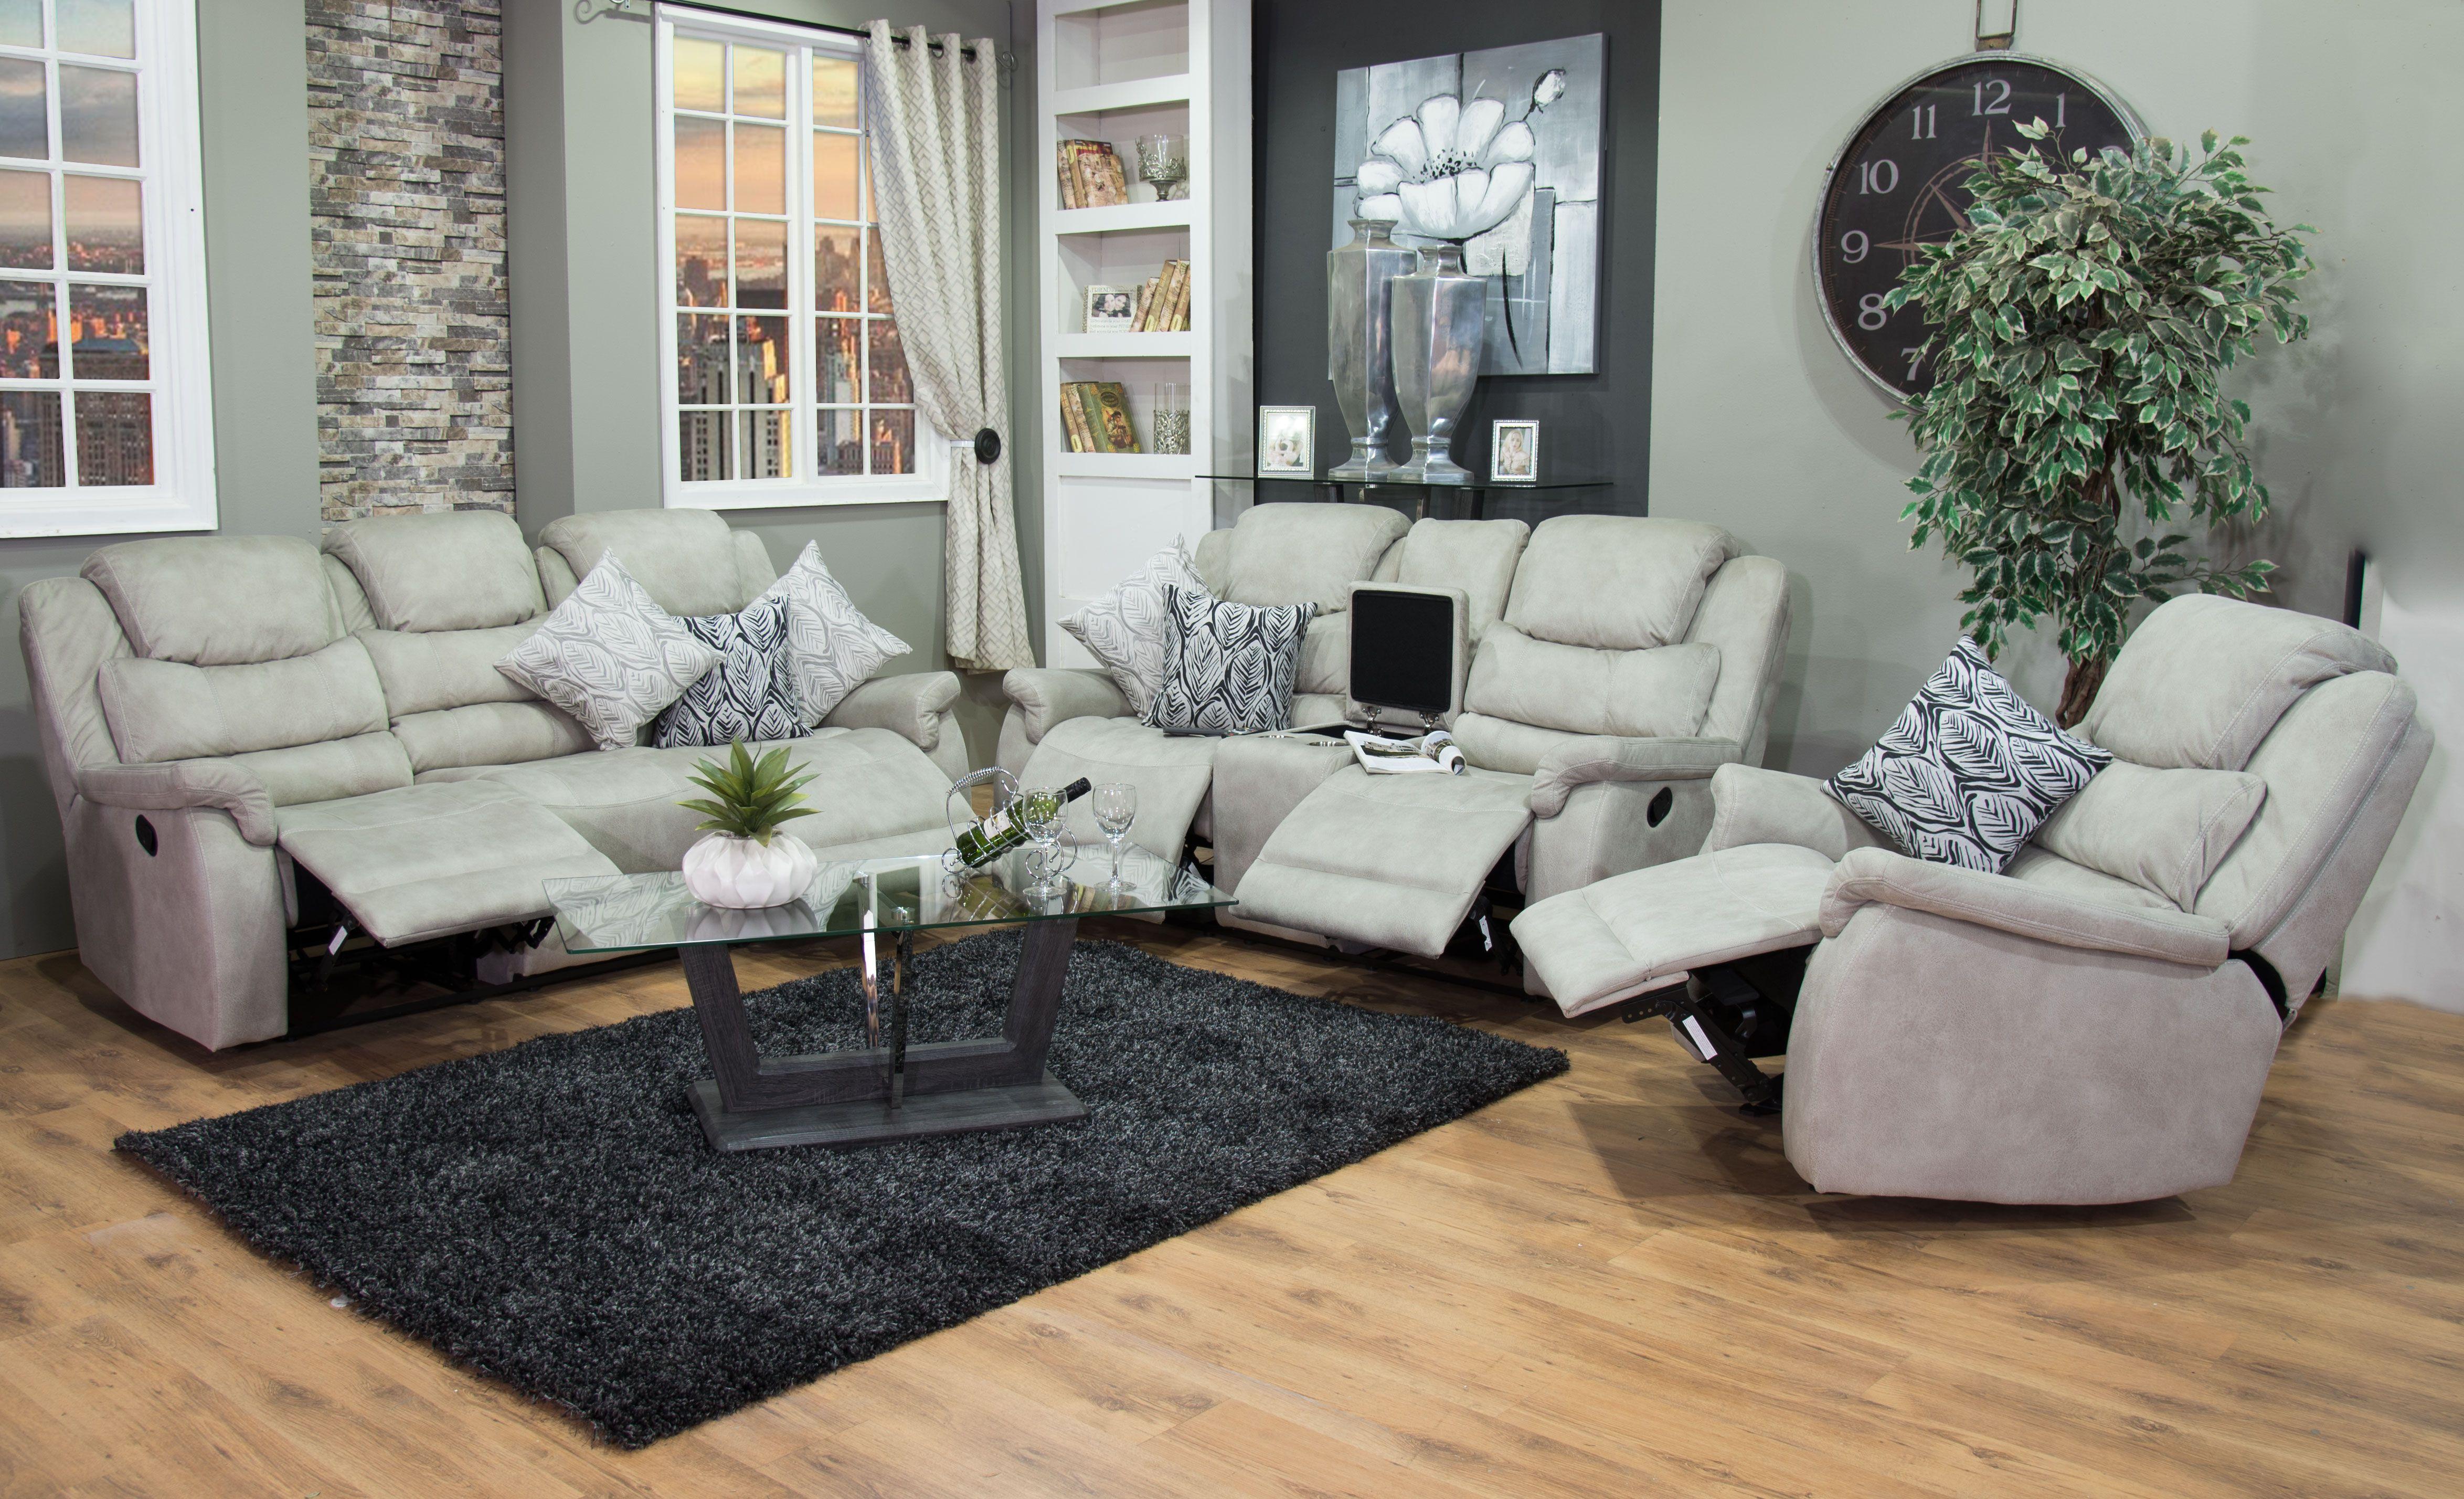 Venice Lounge Suite By Discount Decor Contact Us 011 616 2026 8